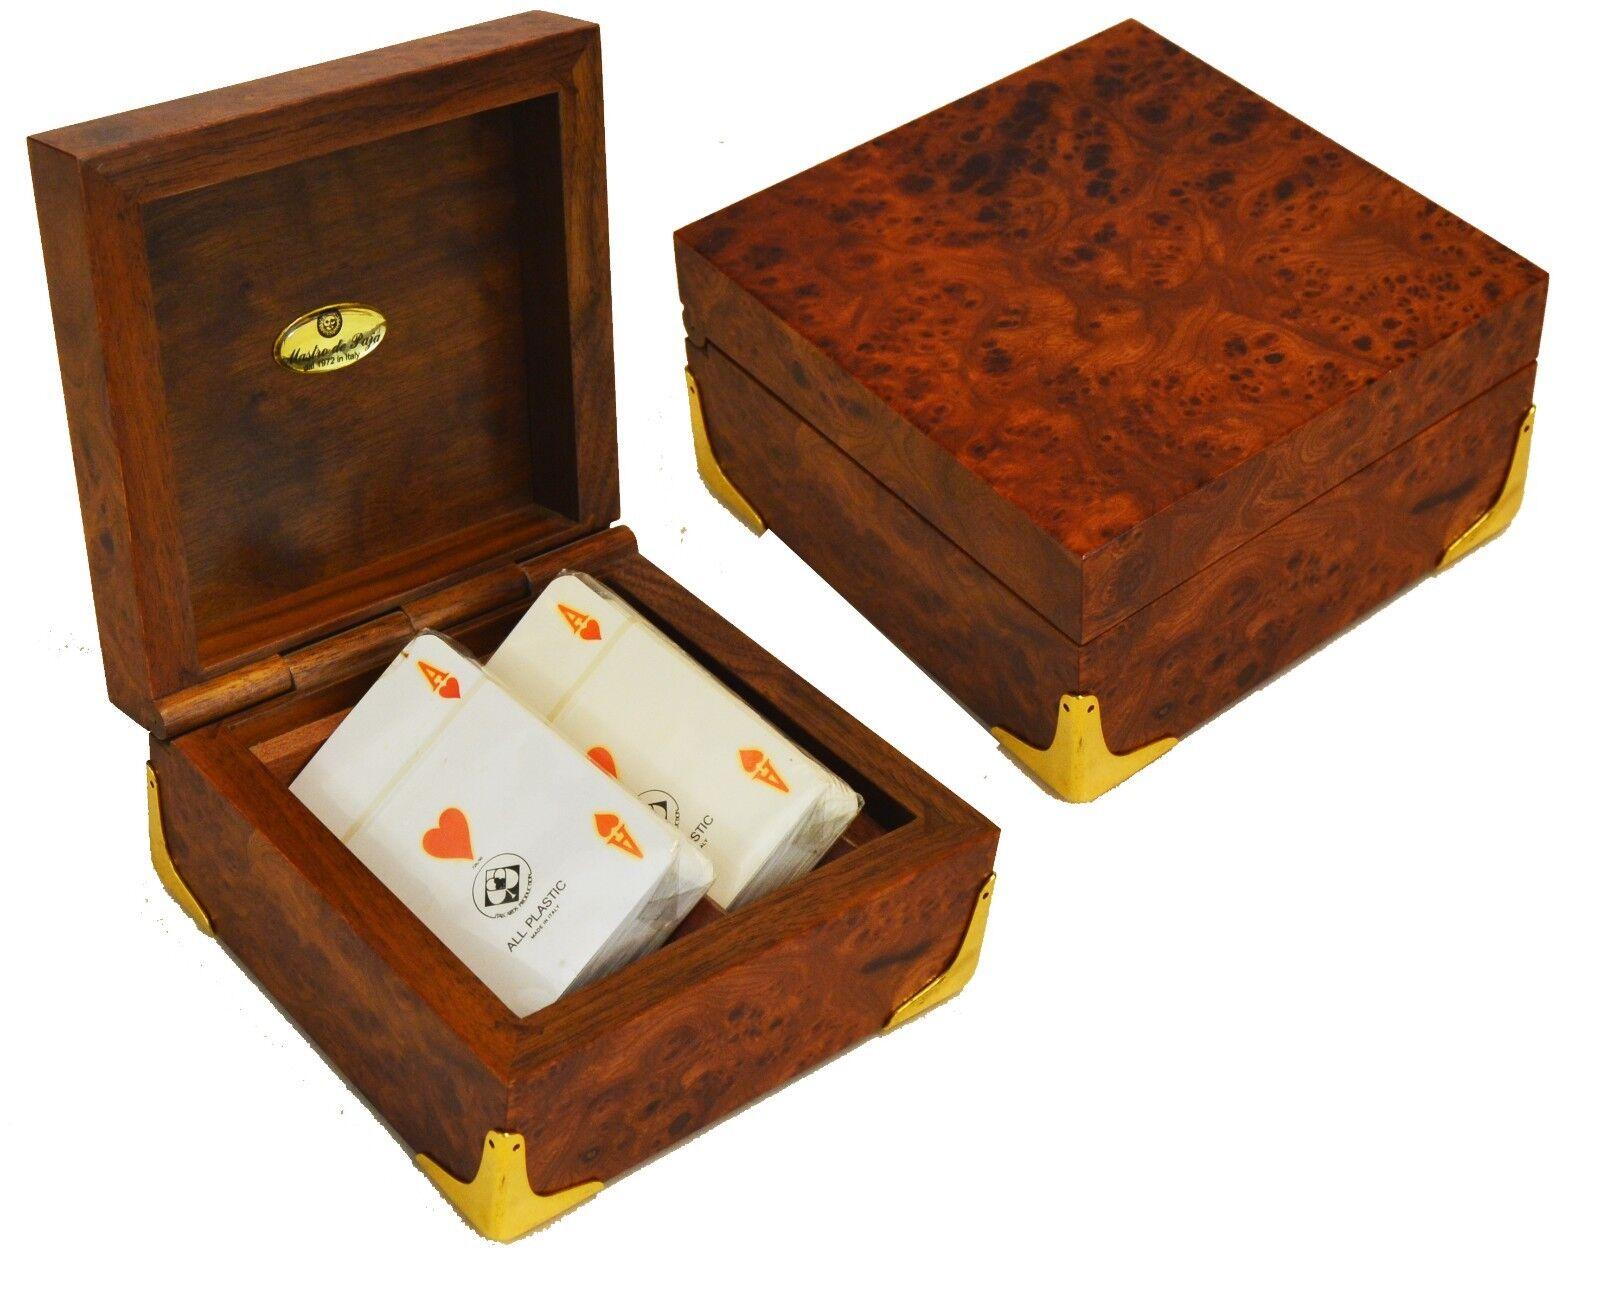 COFANETTO DA CARTE - BOX FOR CARDS